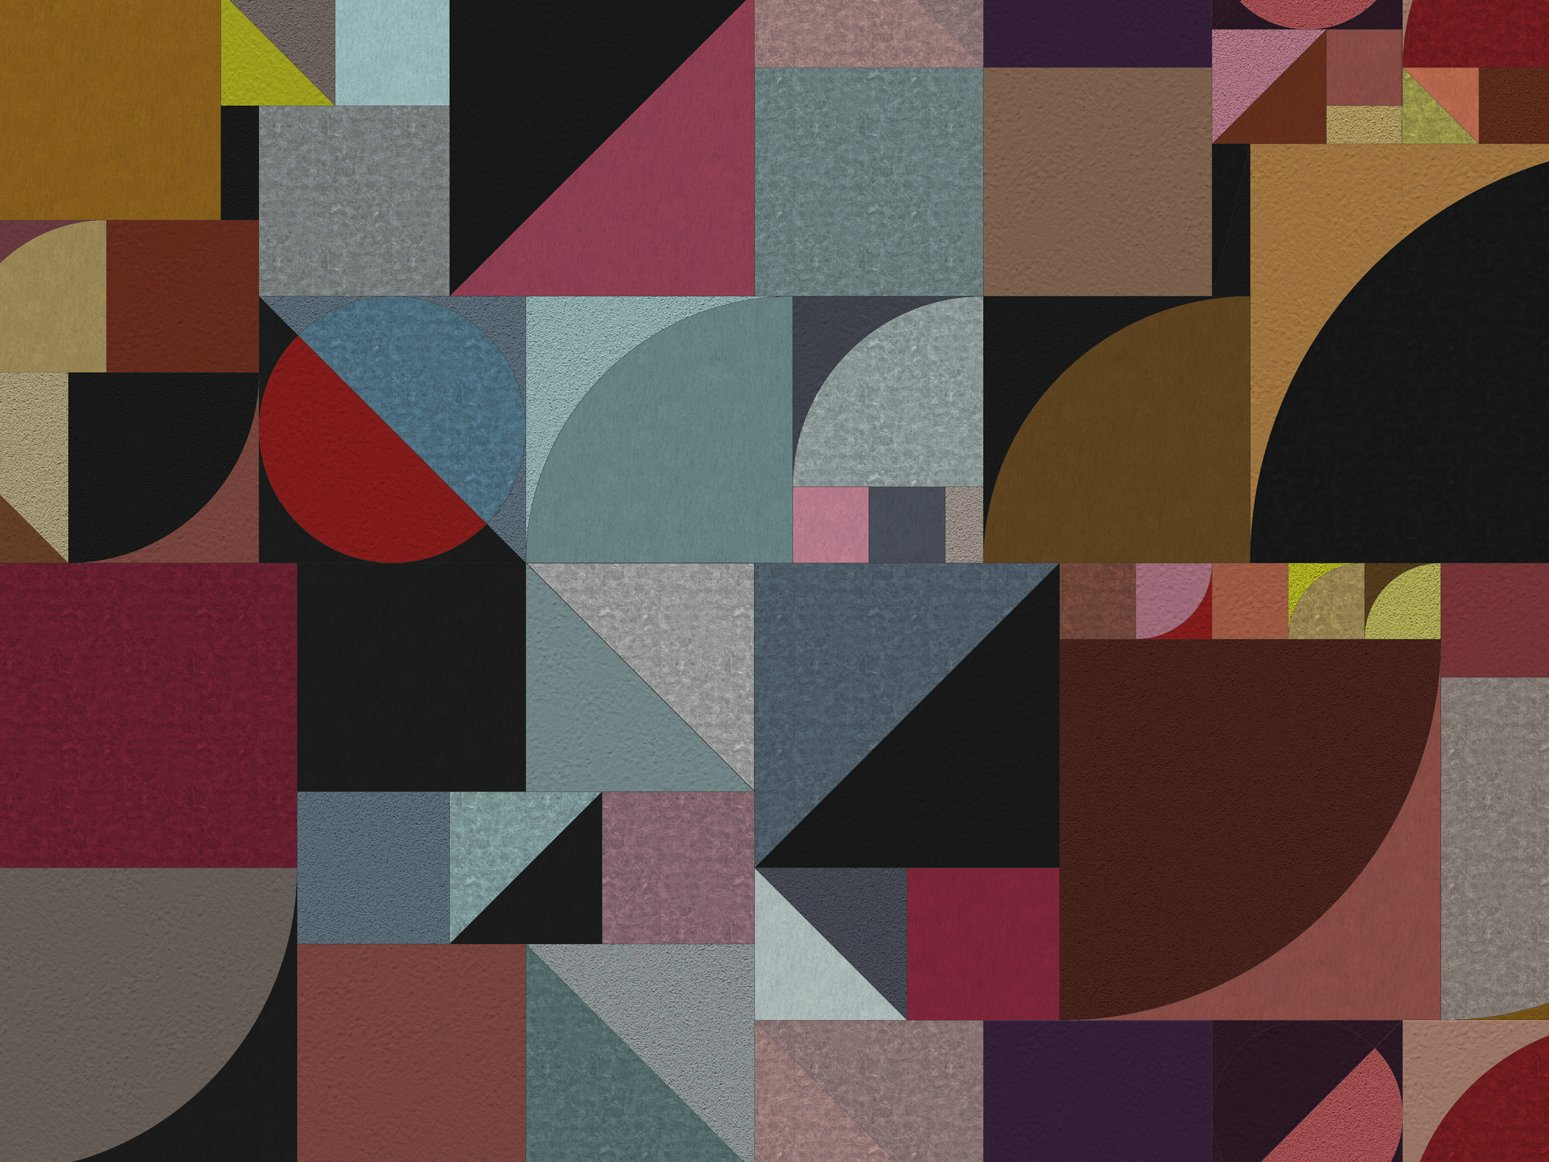 geometrische tapete f r aussen bauhaus by wall dec design. Black Bedroom Furniture Sets. Home Design Ideas